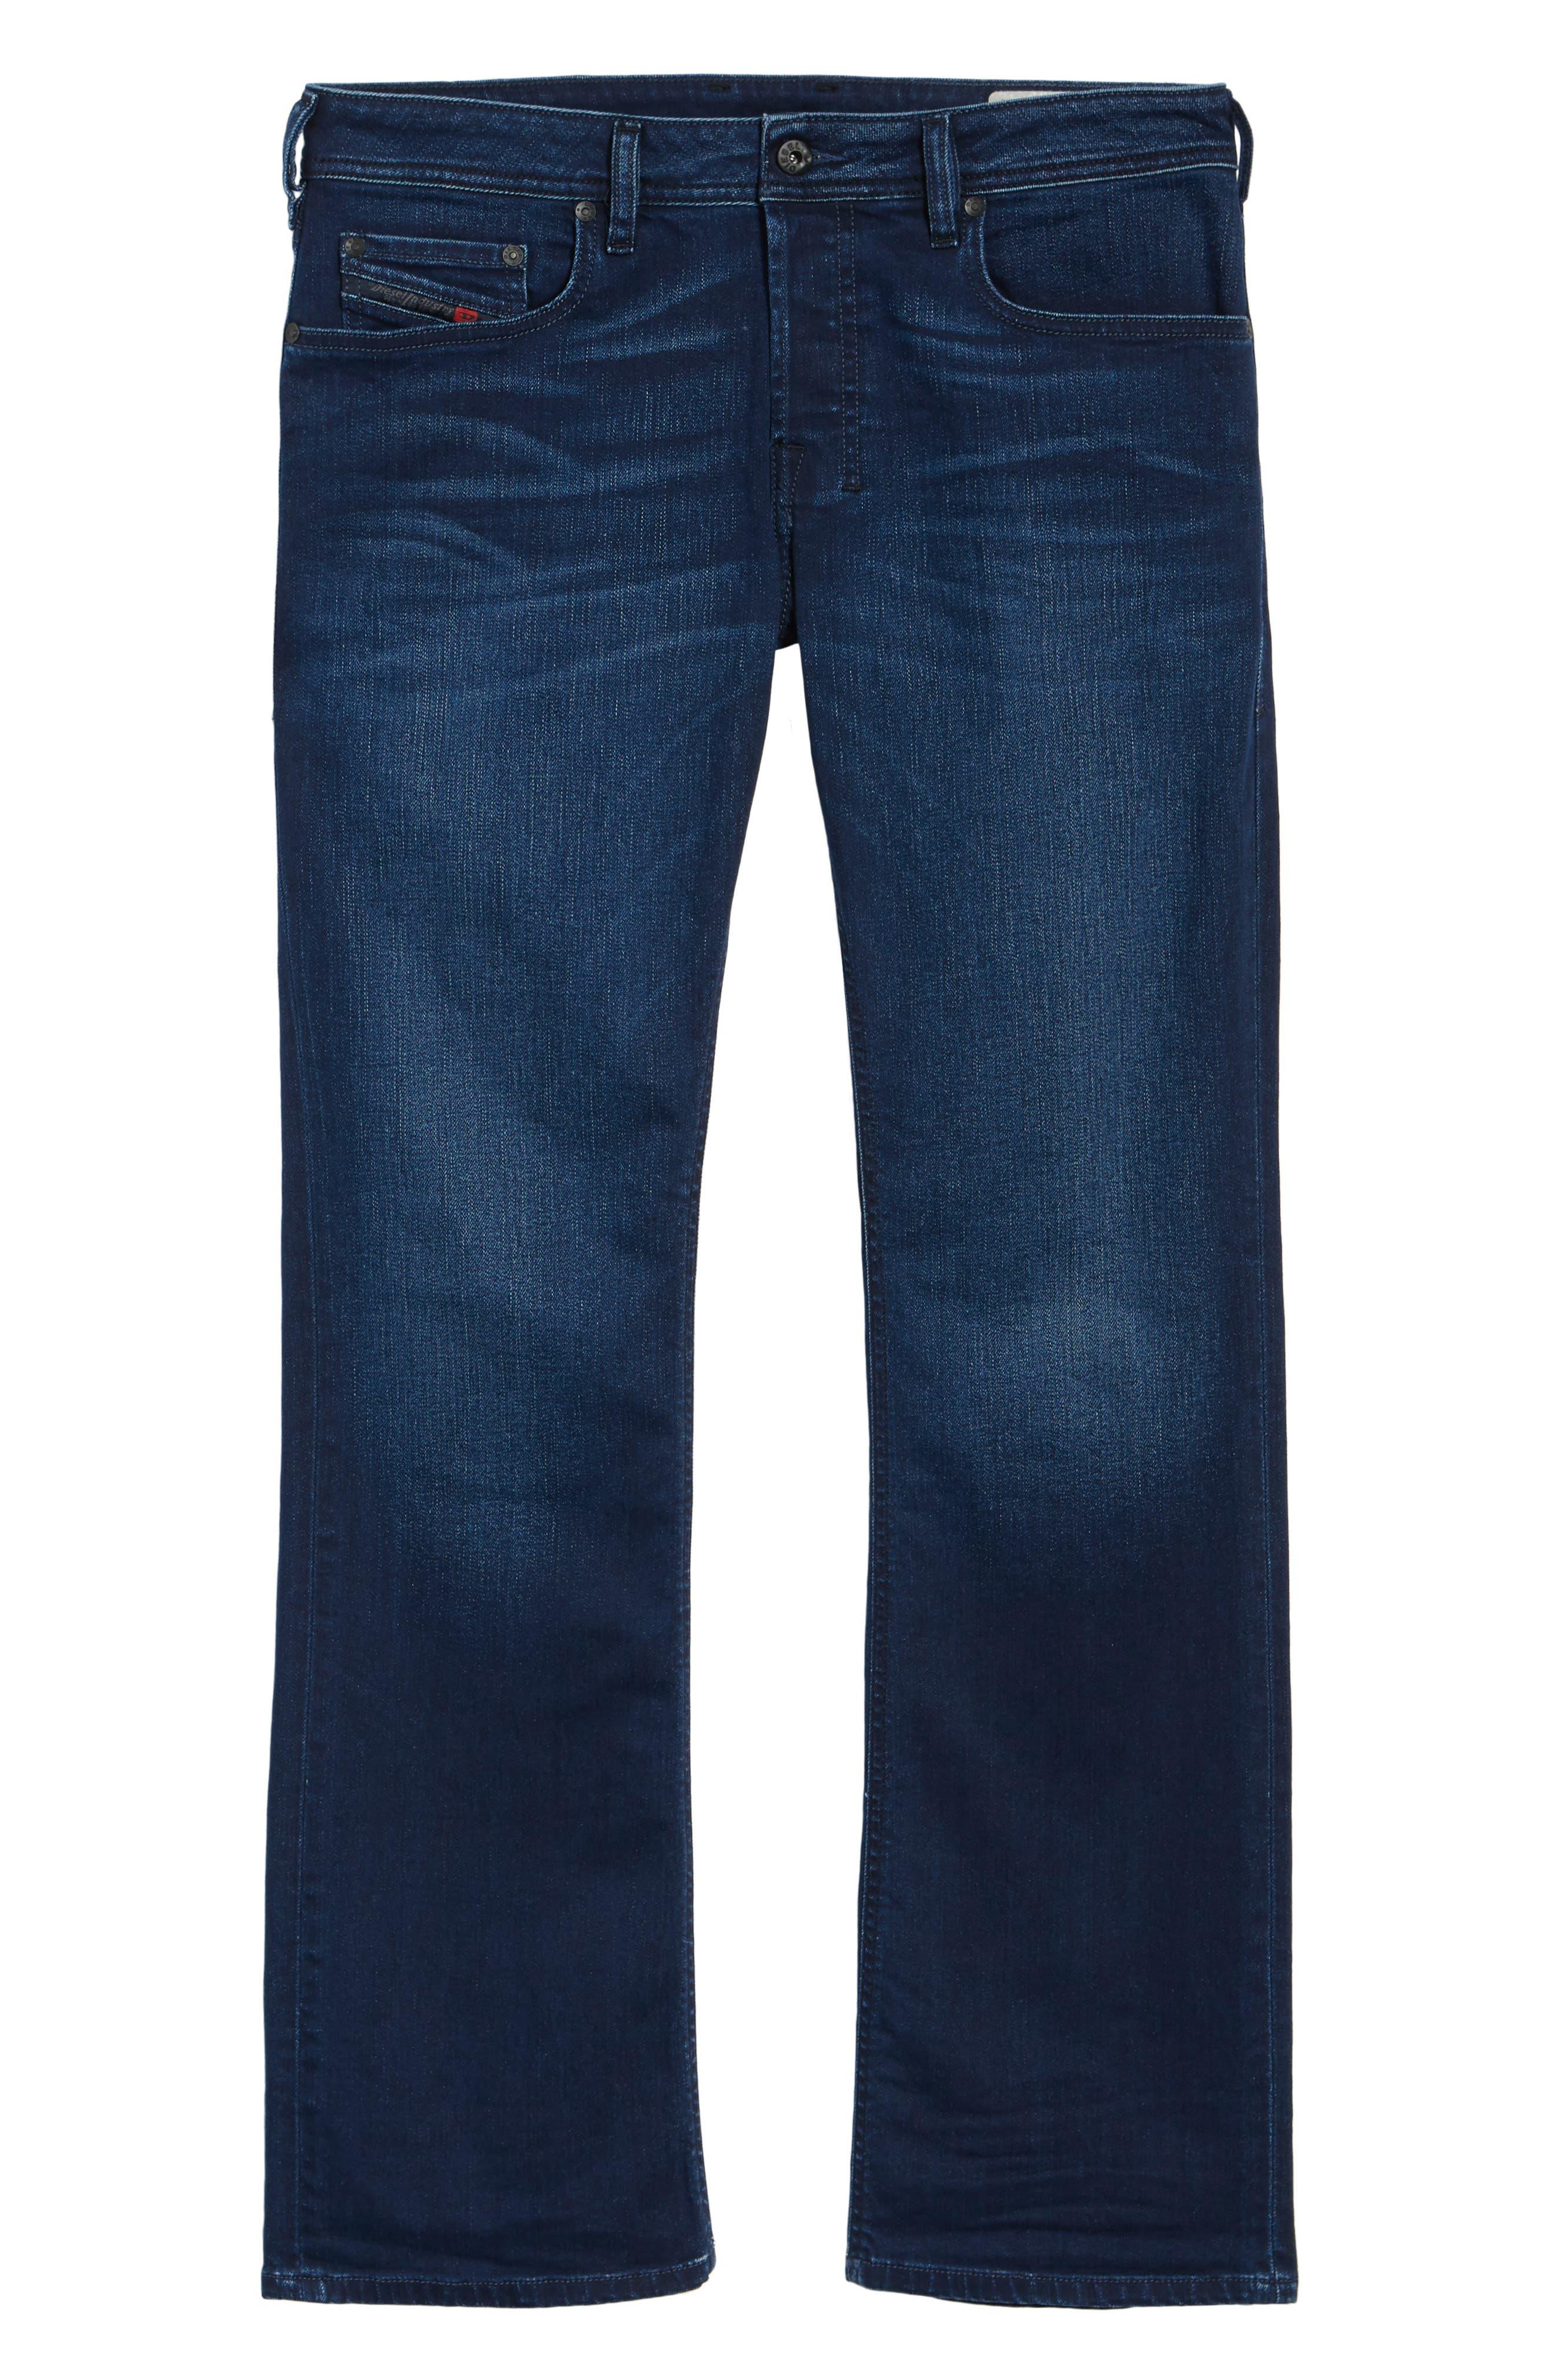 Zatiny Bootcut Jeans,                             Alternate thumbnail 6, color,                             84Hj